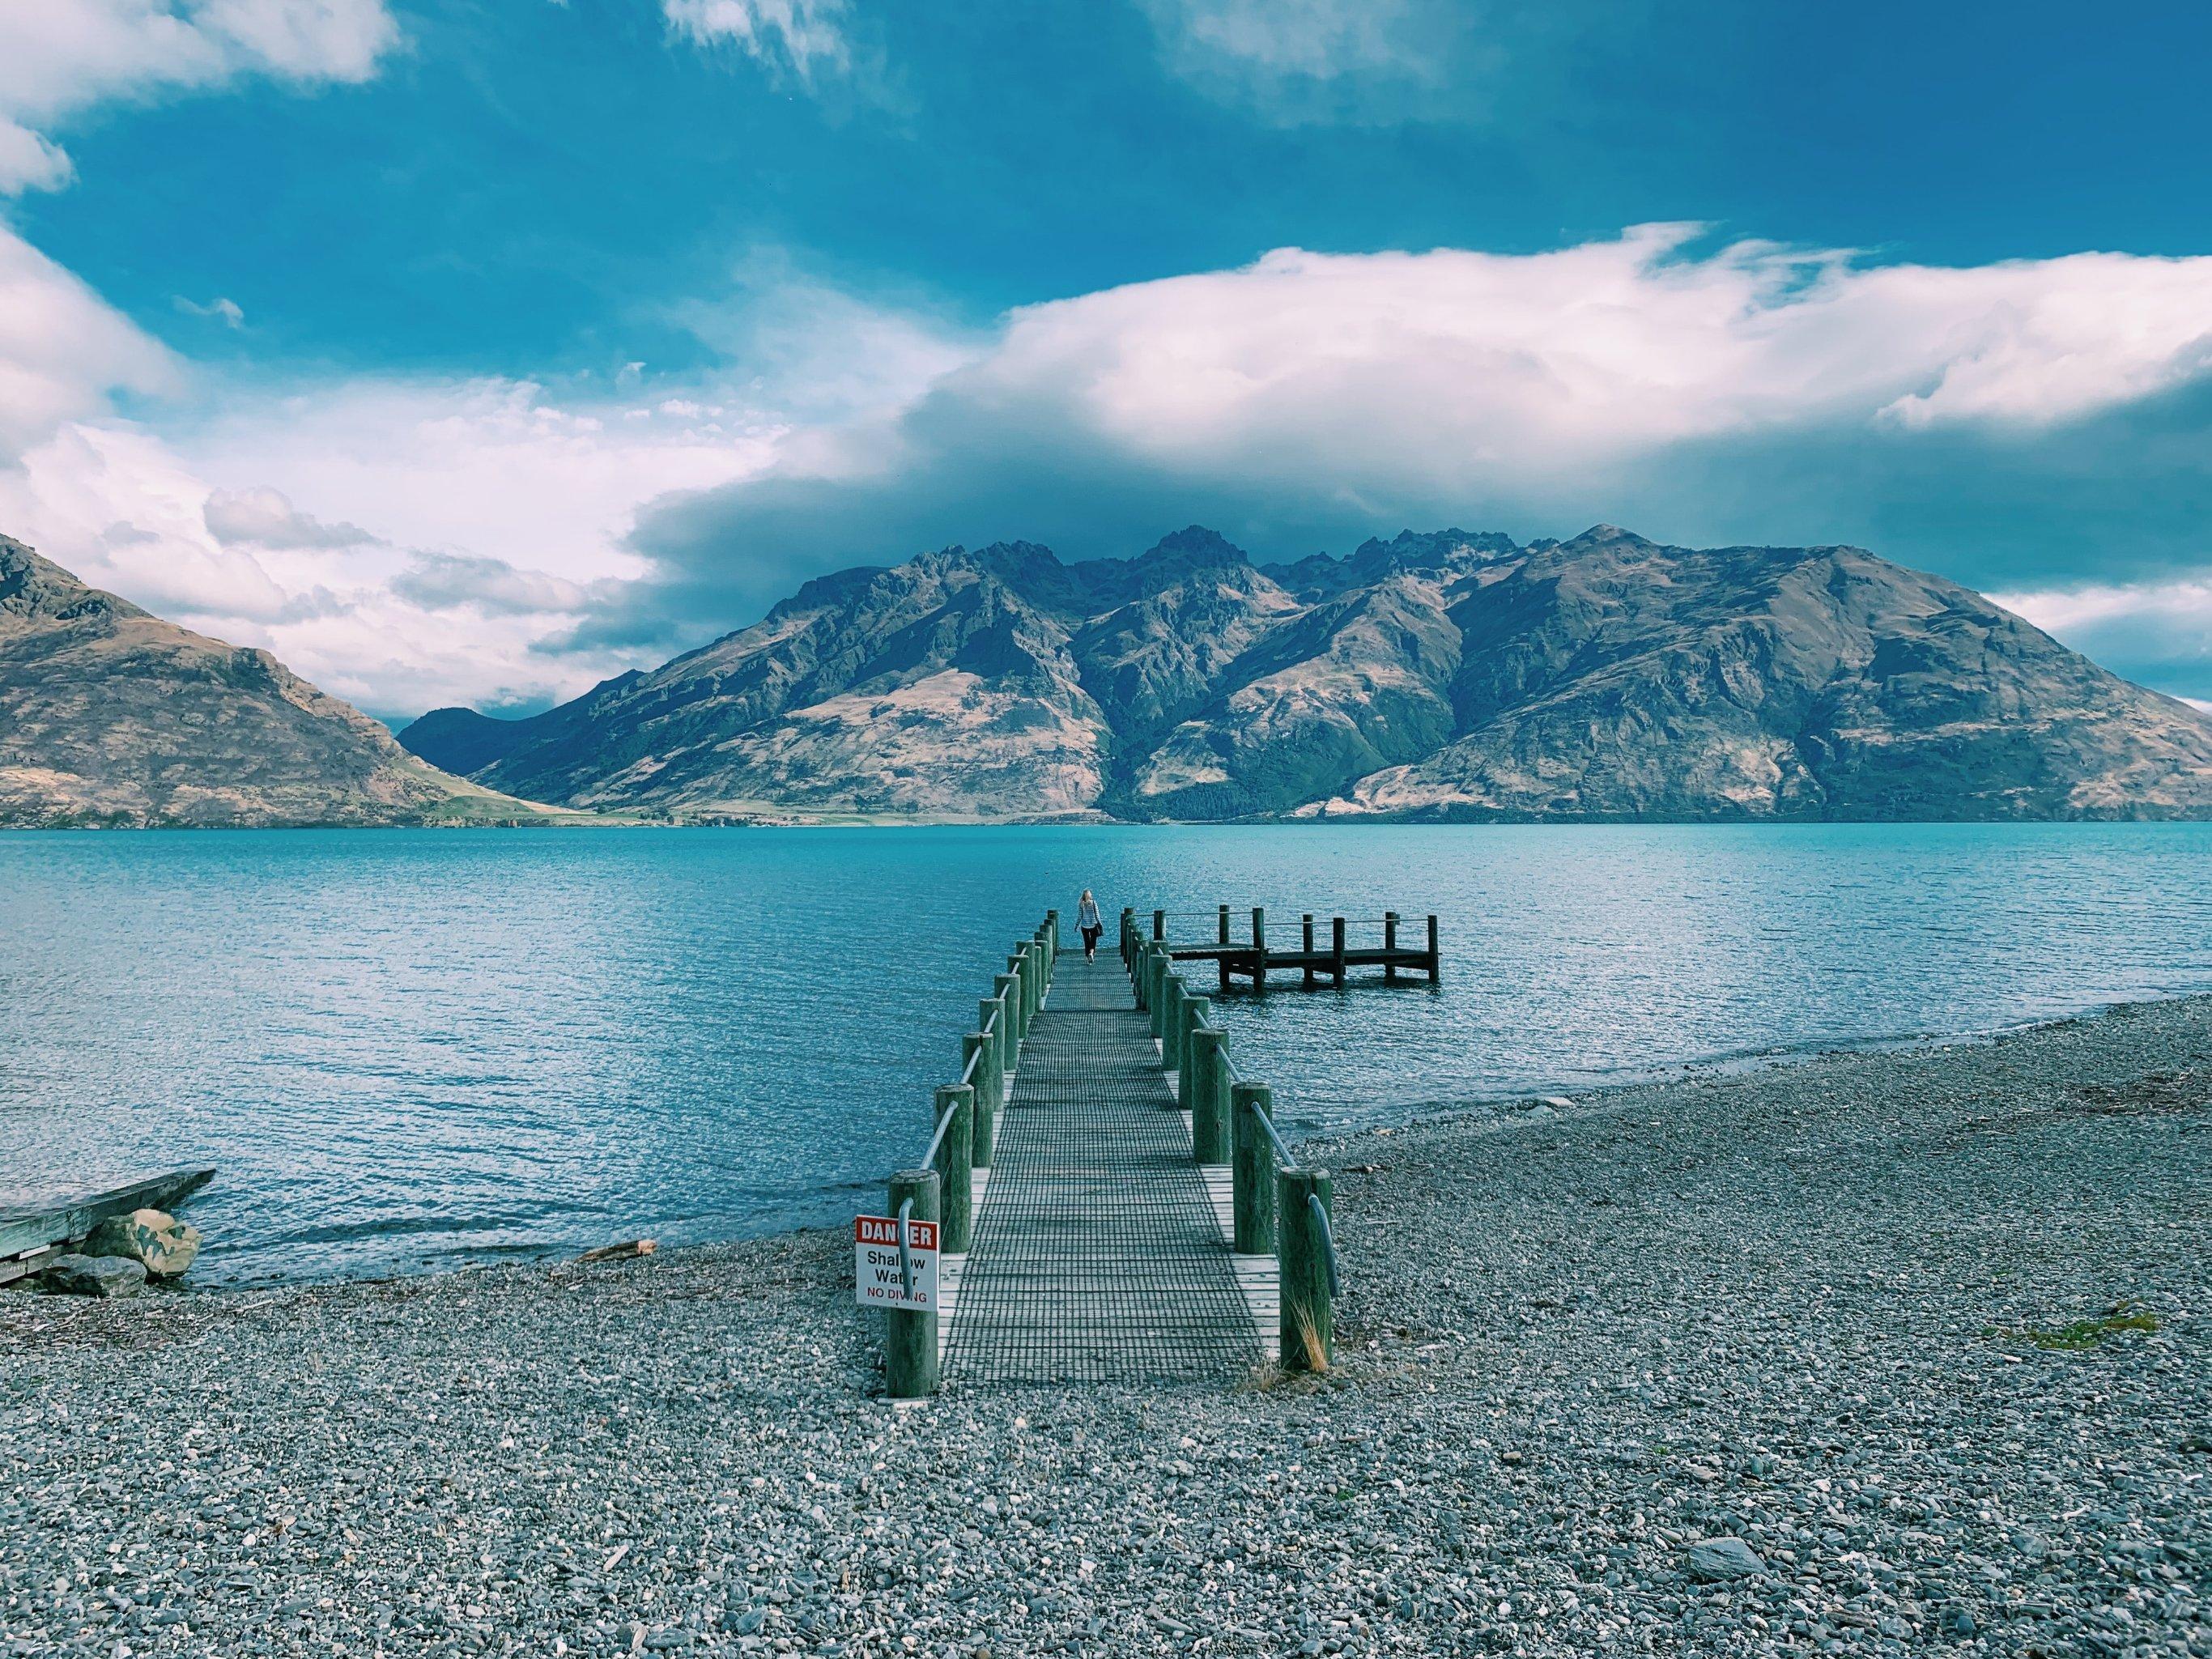 15-Day Family Fun in New Zealand - New Zealand Itinerary